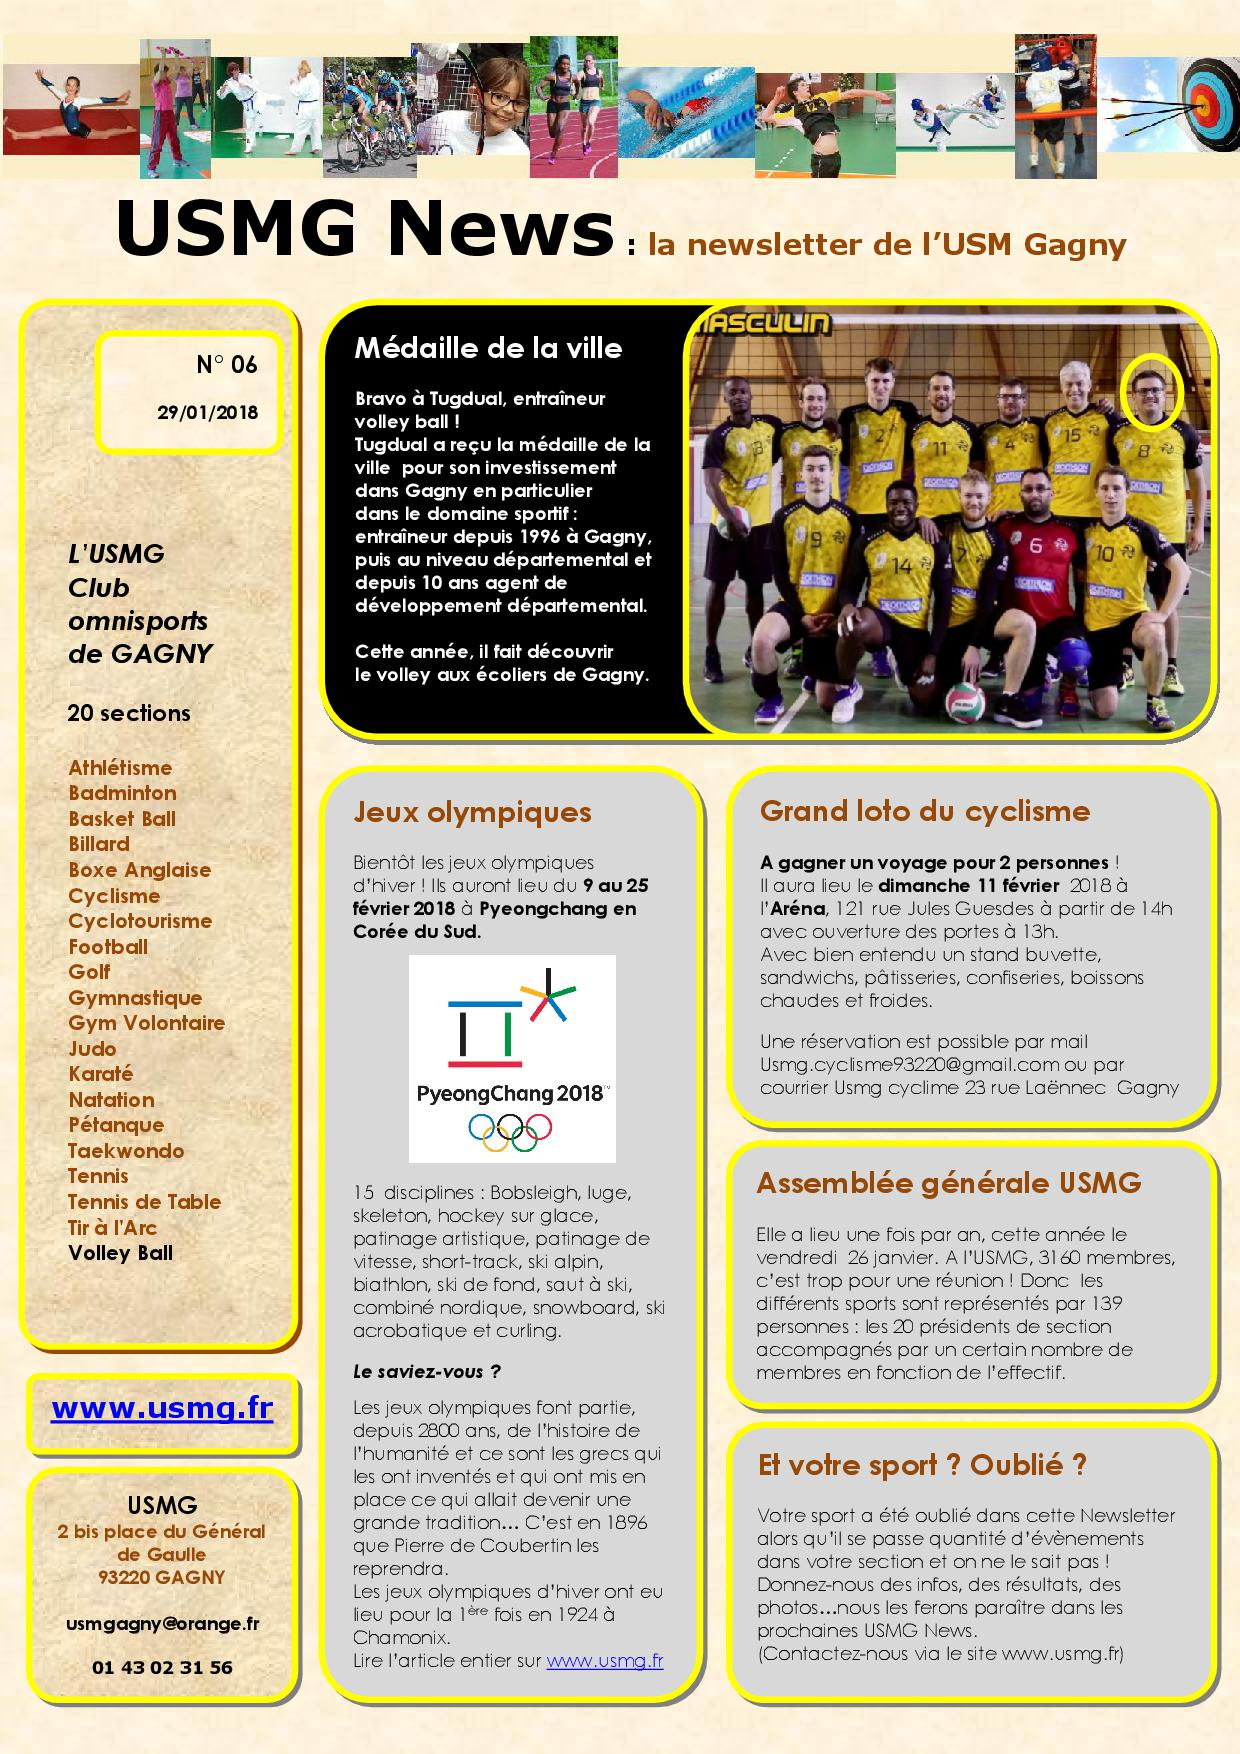 Usmg news 06